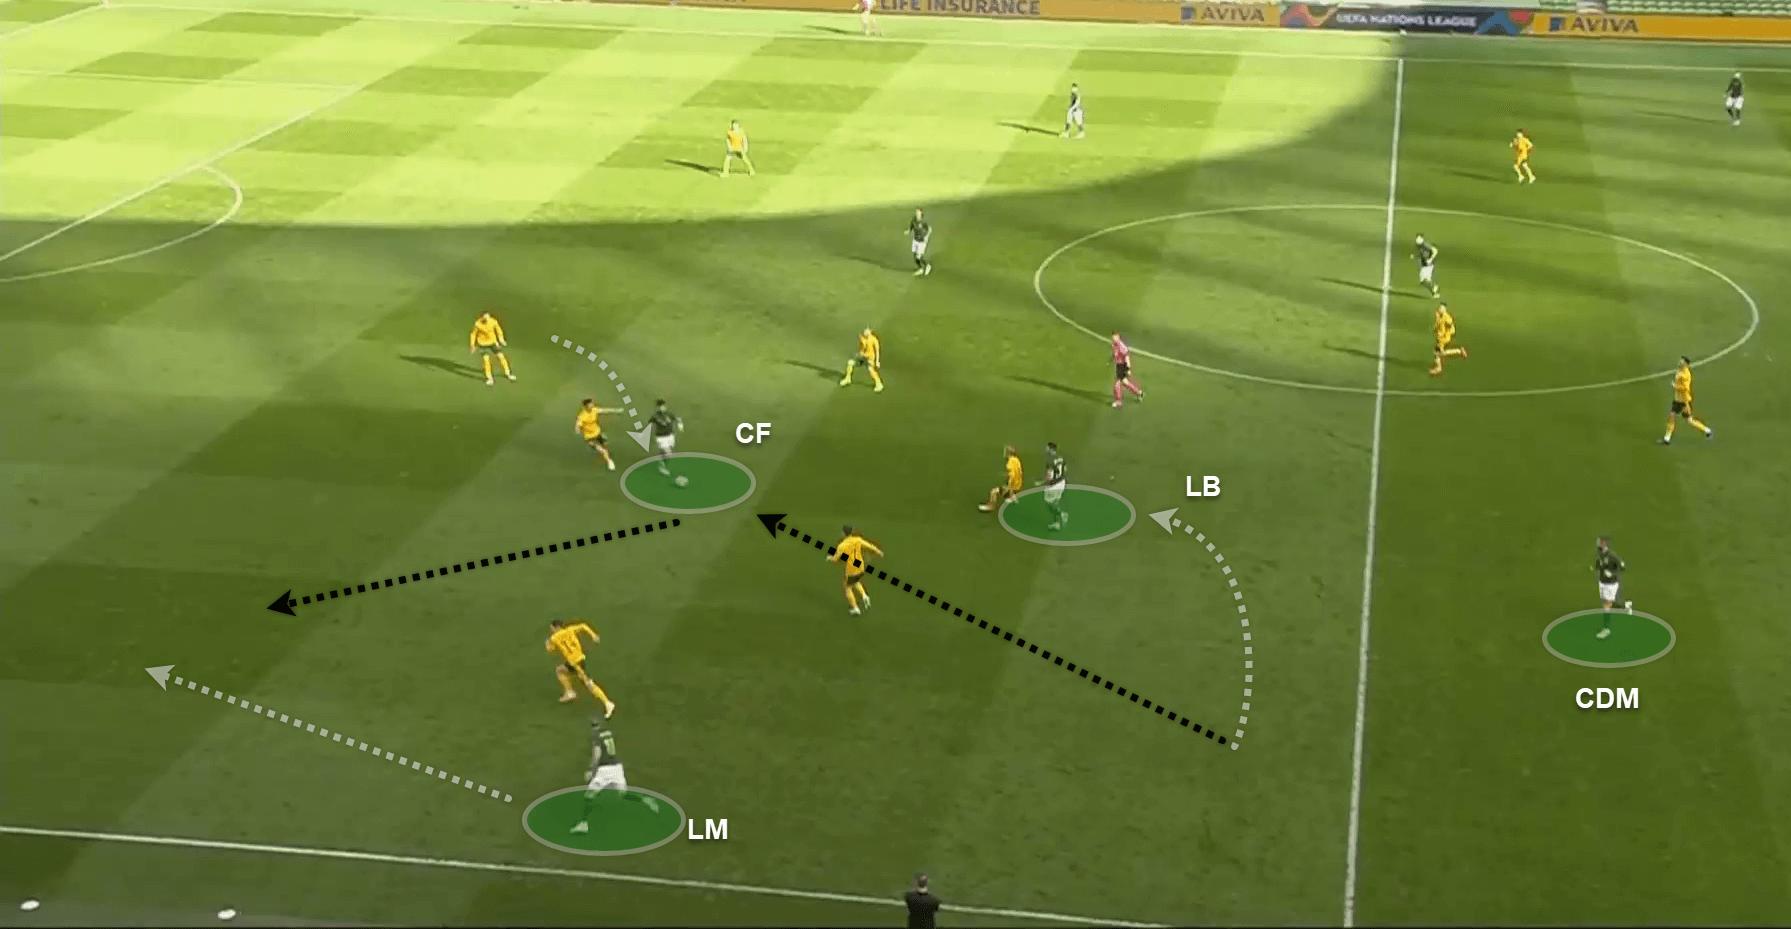 UEFA Nations League 2020/21: Ireland v Wales - tactical analysis - tactics